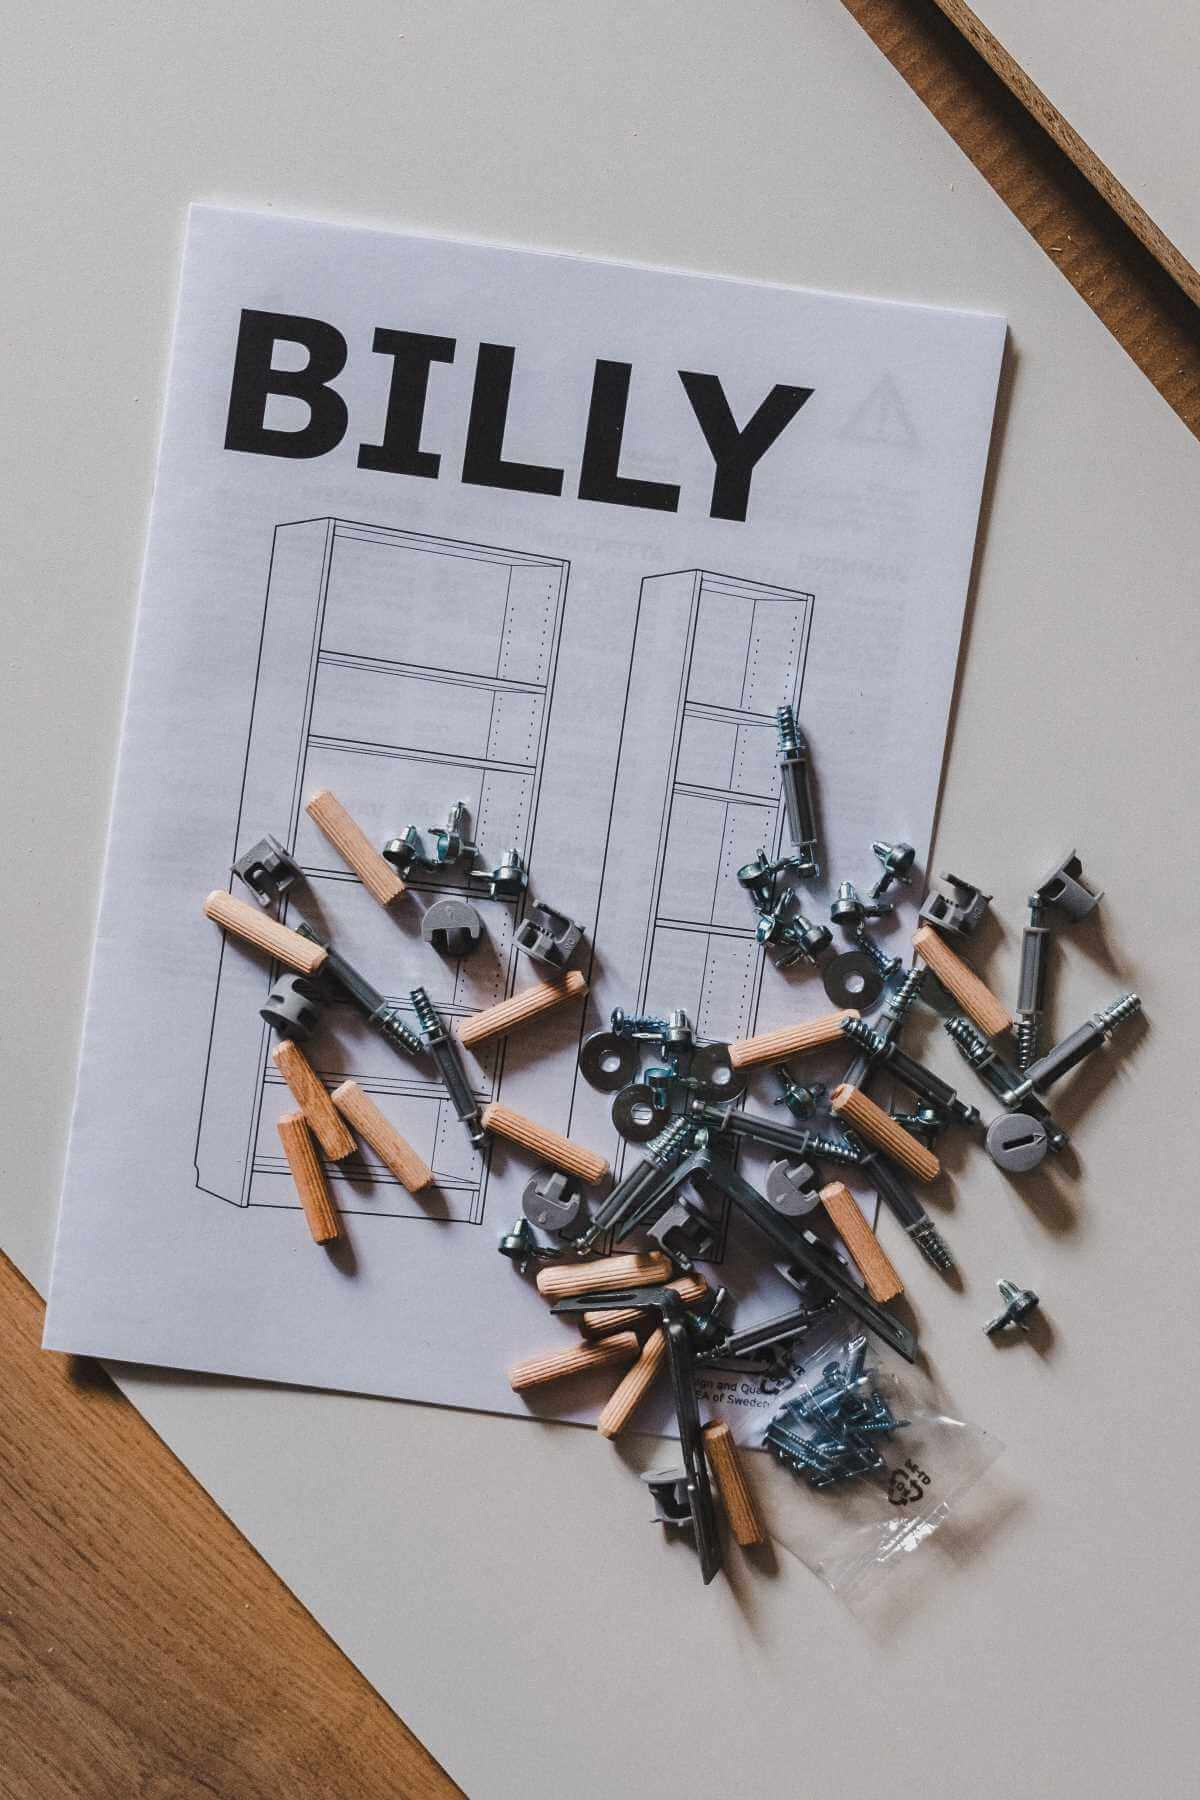 IKEA Billy handleiding